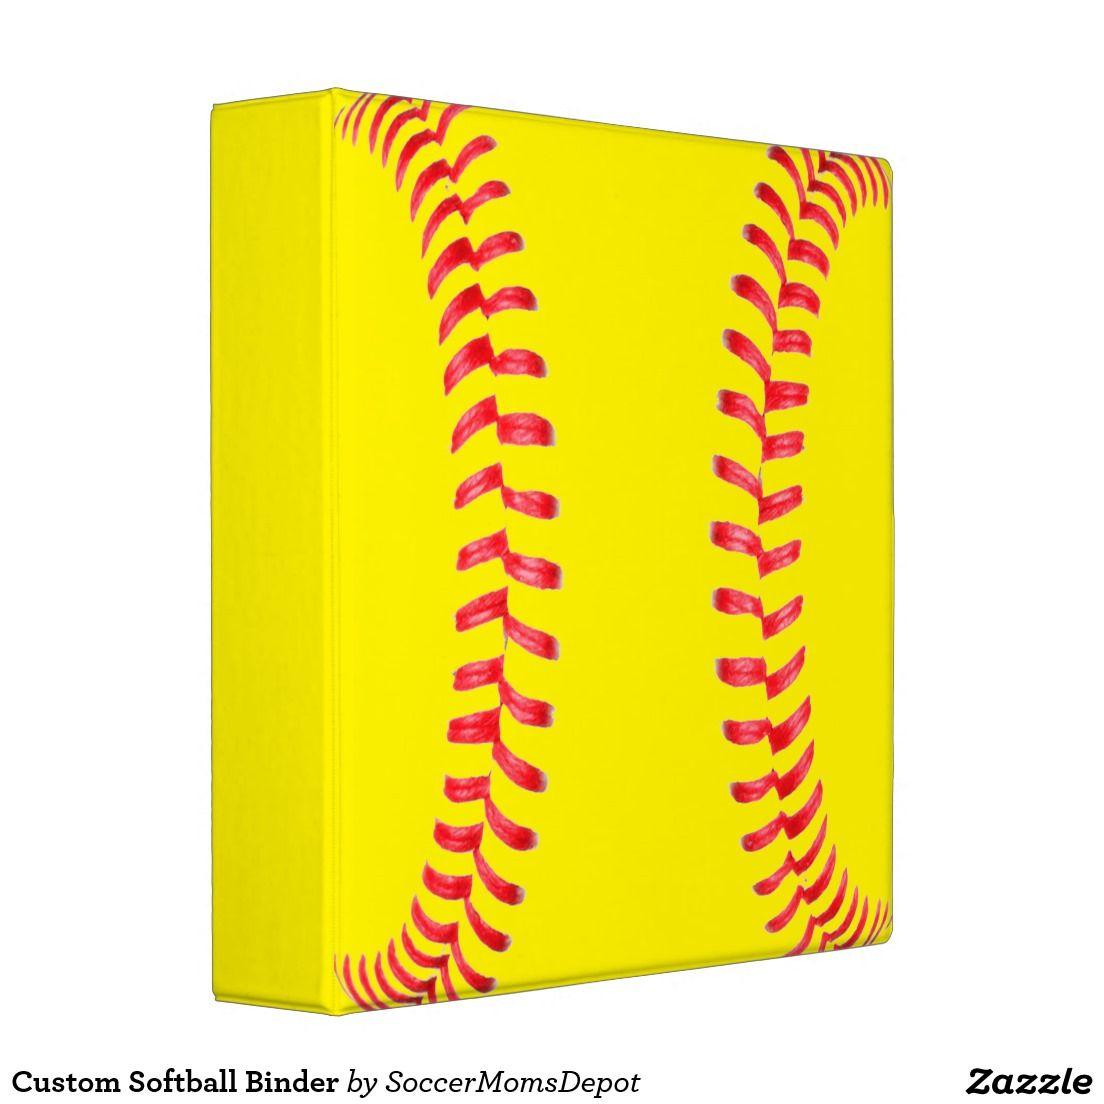 Custom Softball Binder